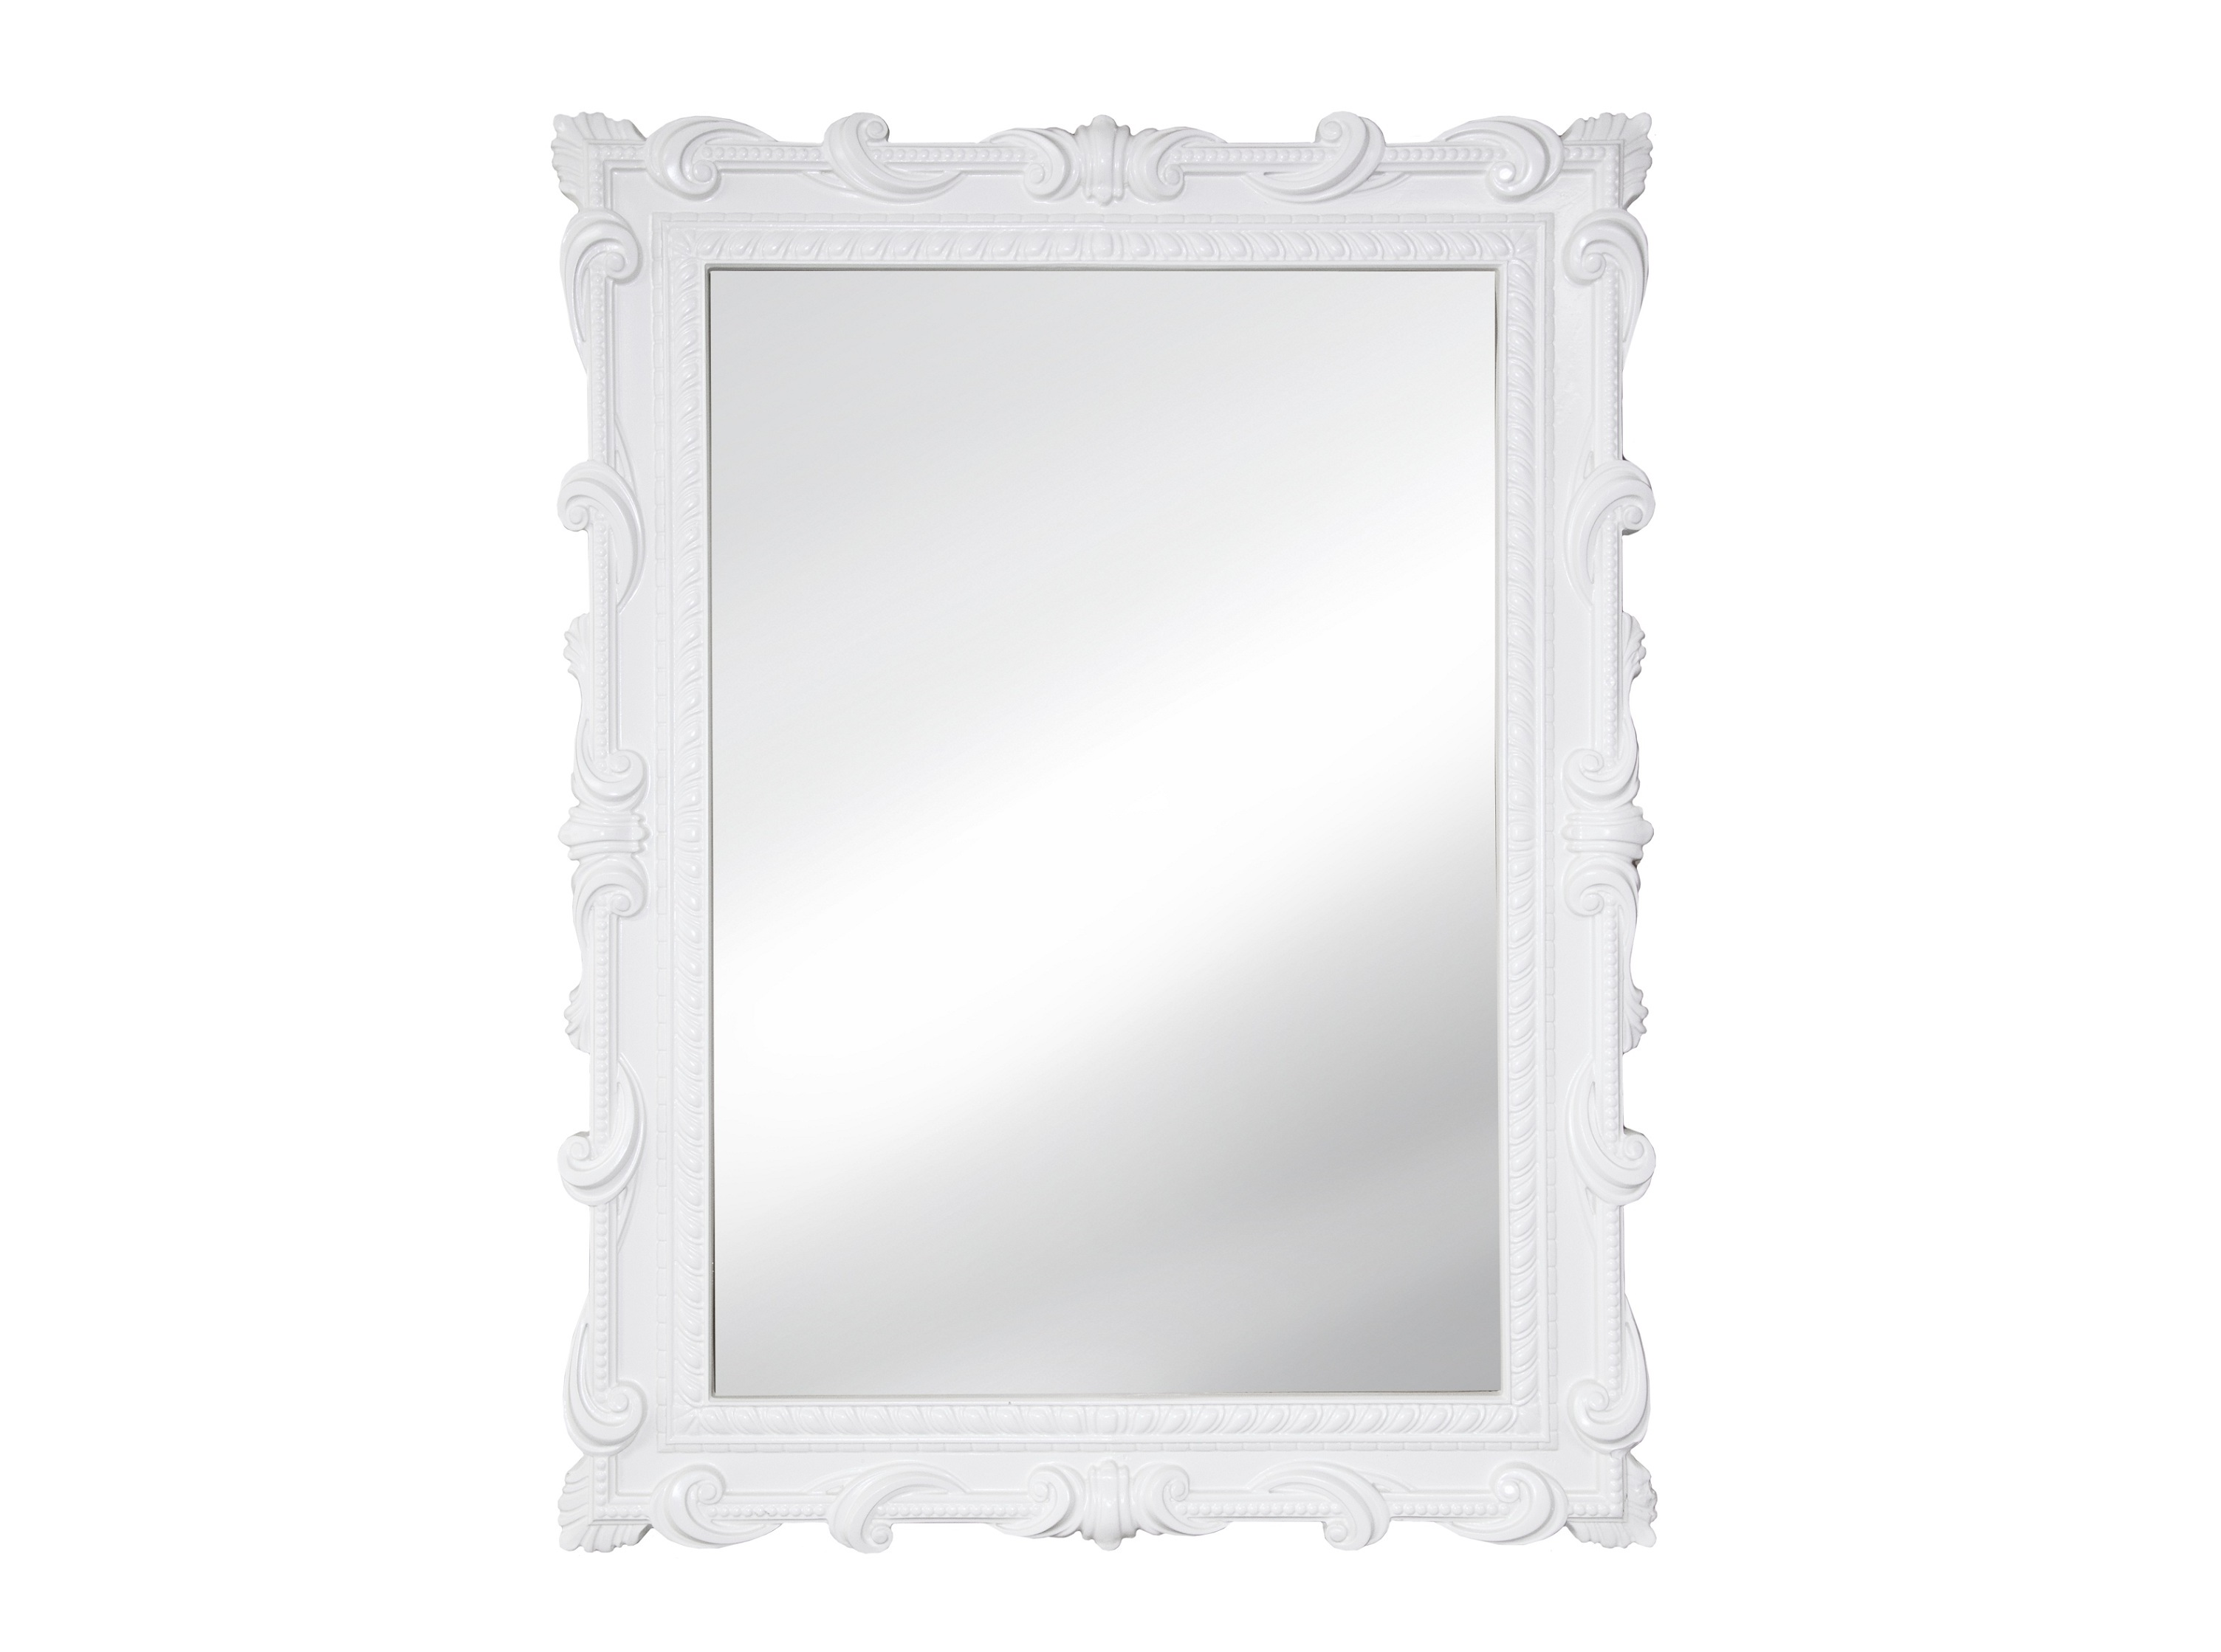 Зеркало Reeforma 15432462 от thefurnish